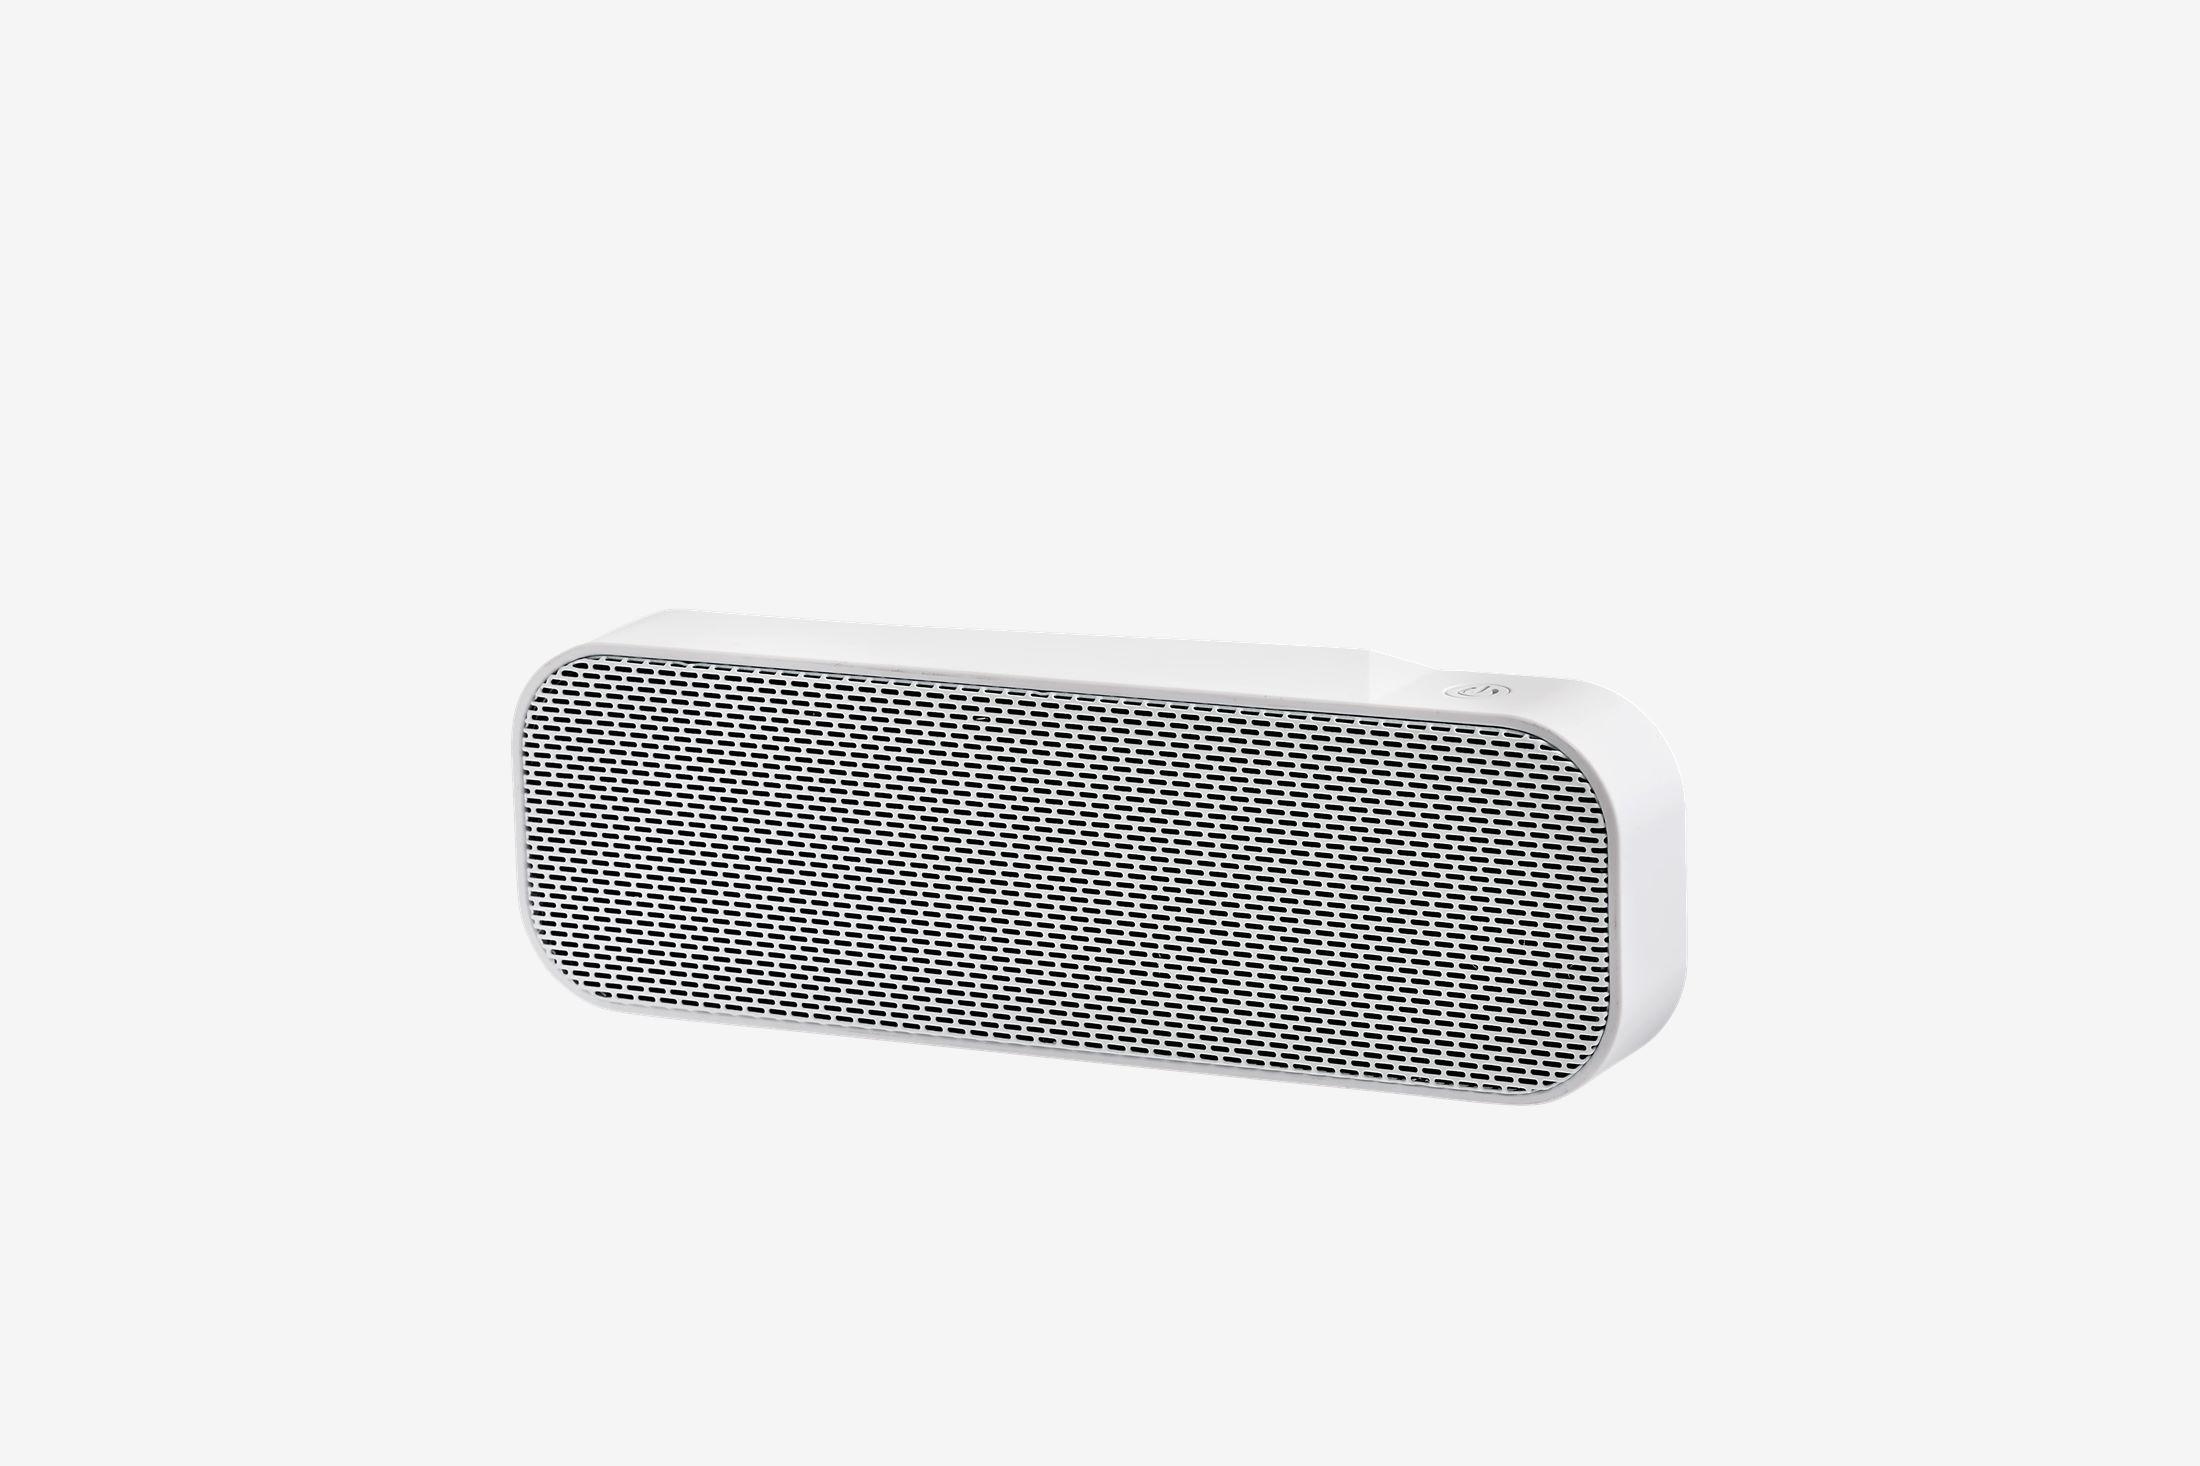 Joy Bluetooth Lautsprecher Kreafunk White White Bluetooth Lautsprecher Lautsprecher Kabellose Lautsprecher